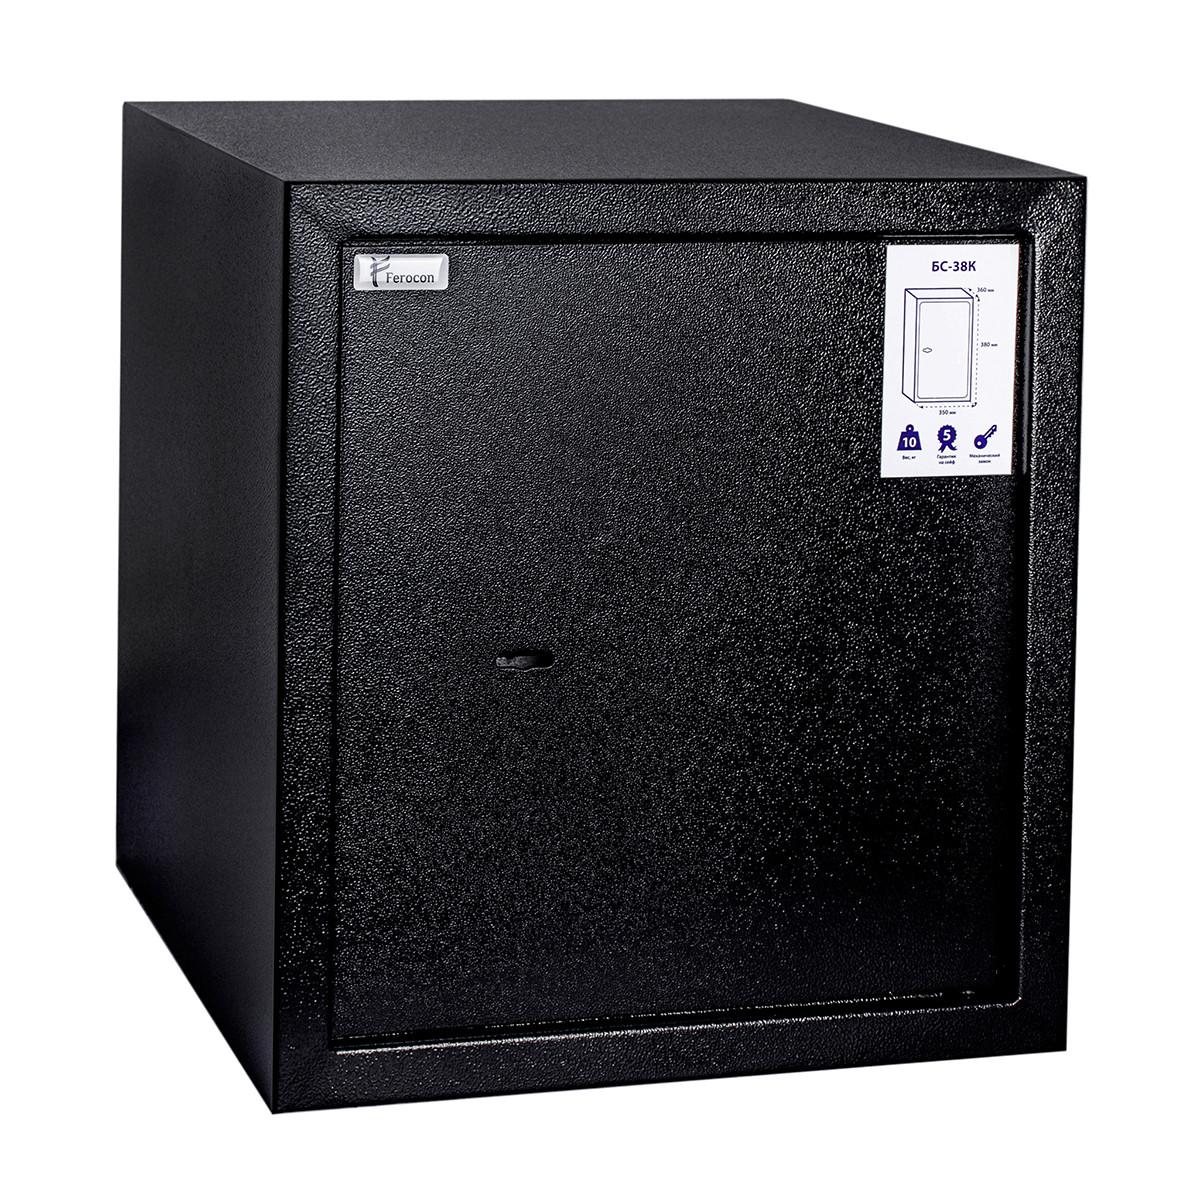 Меблевий сейф Ferocon БС-38К.П1.9005